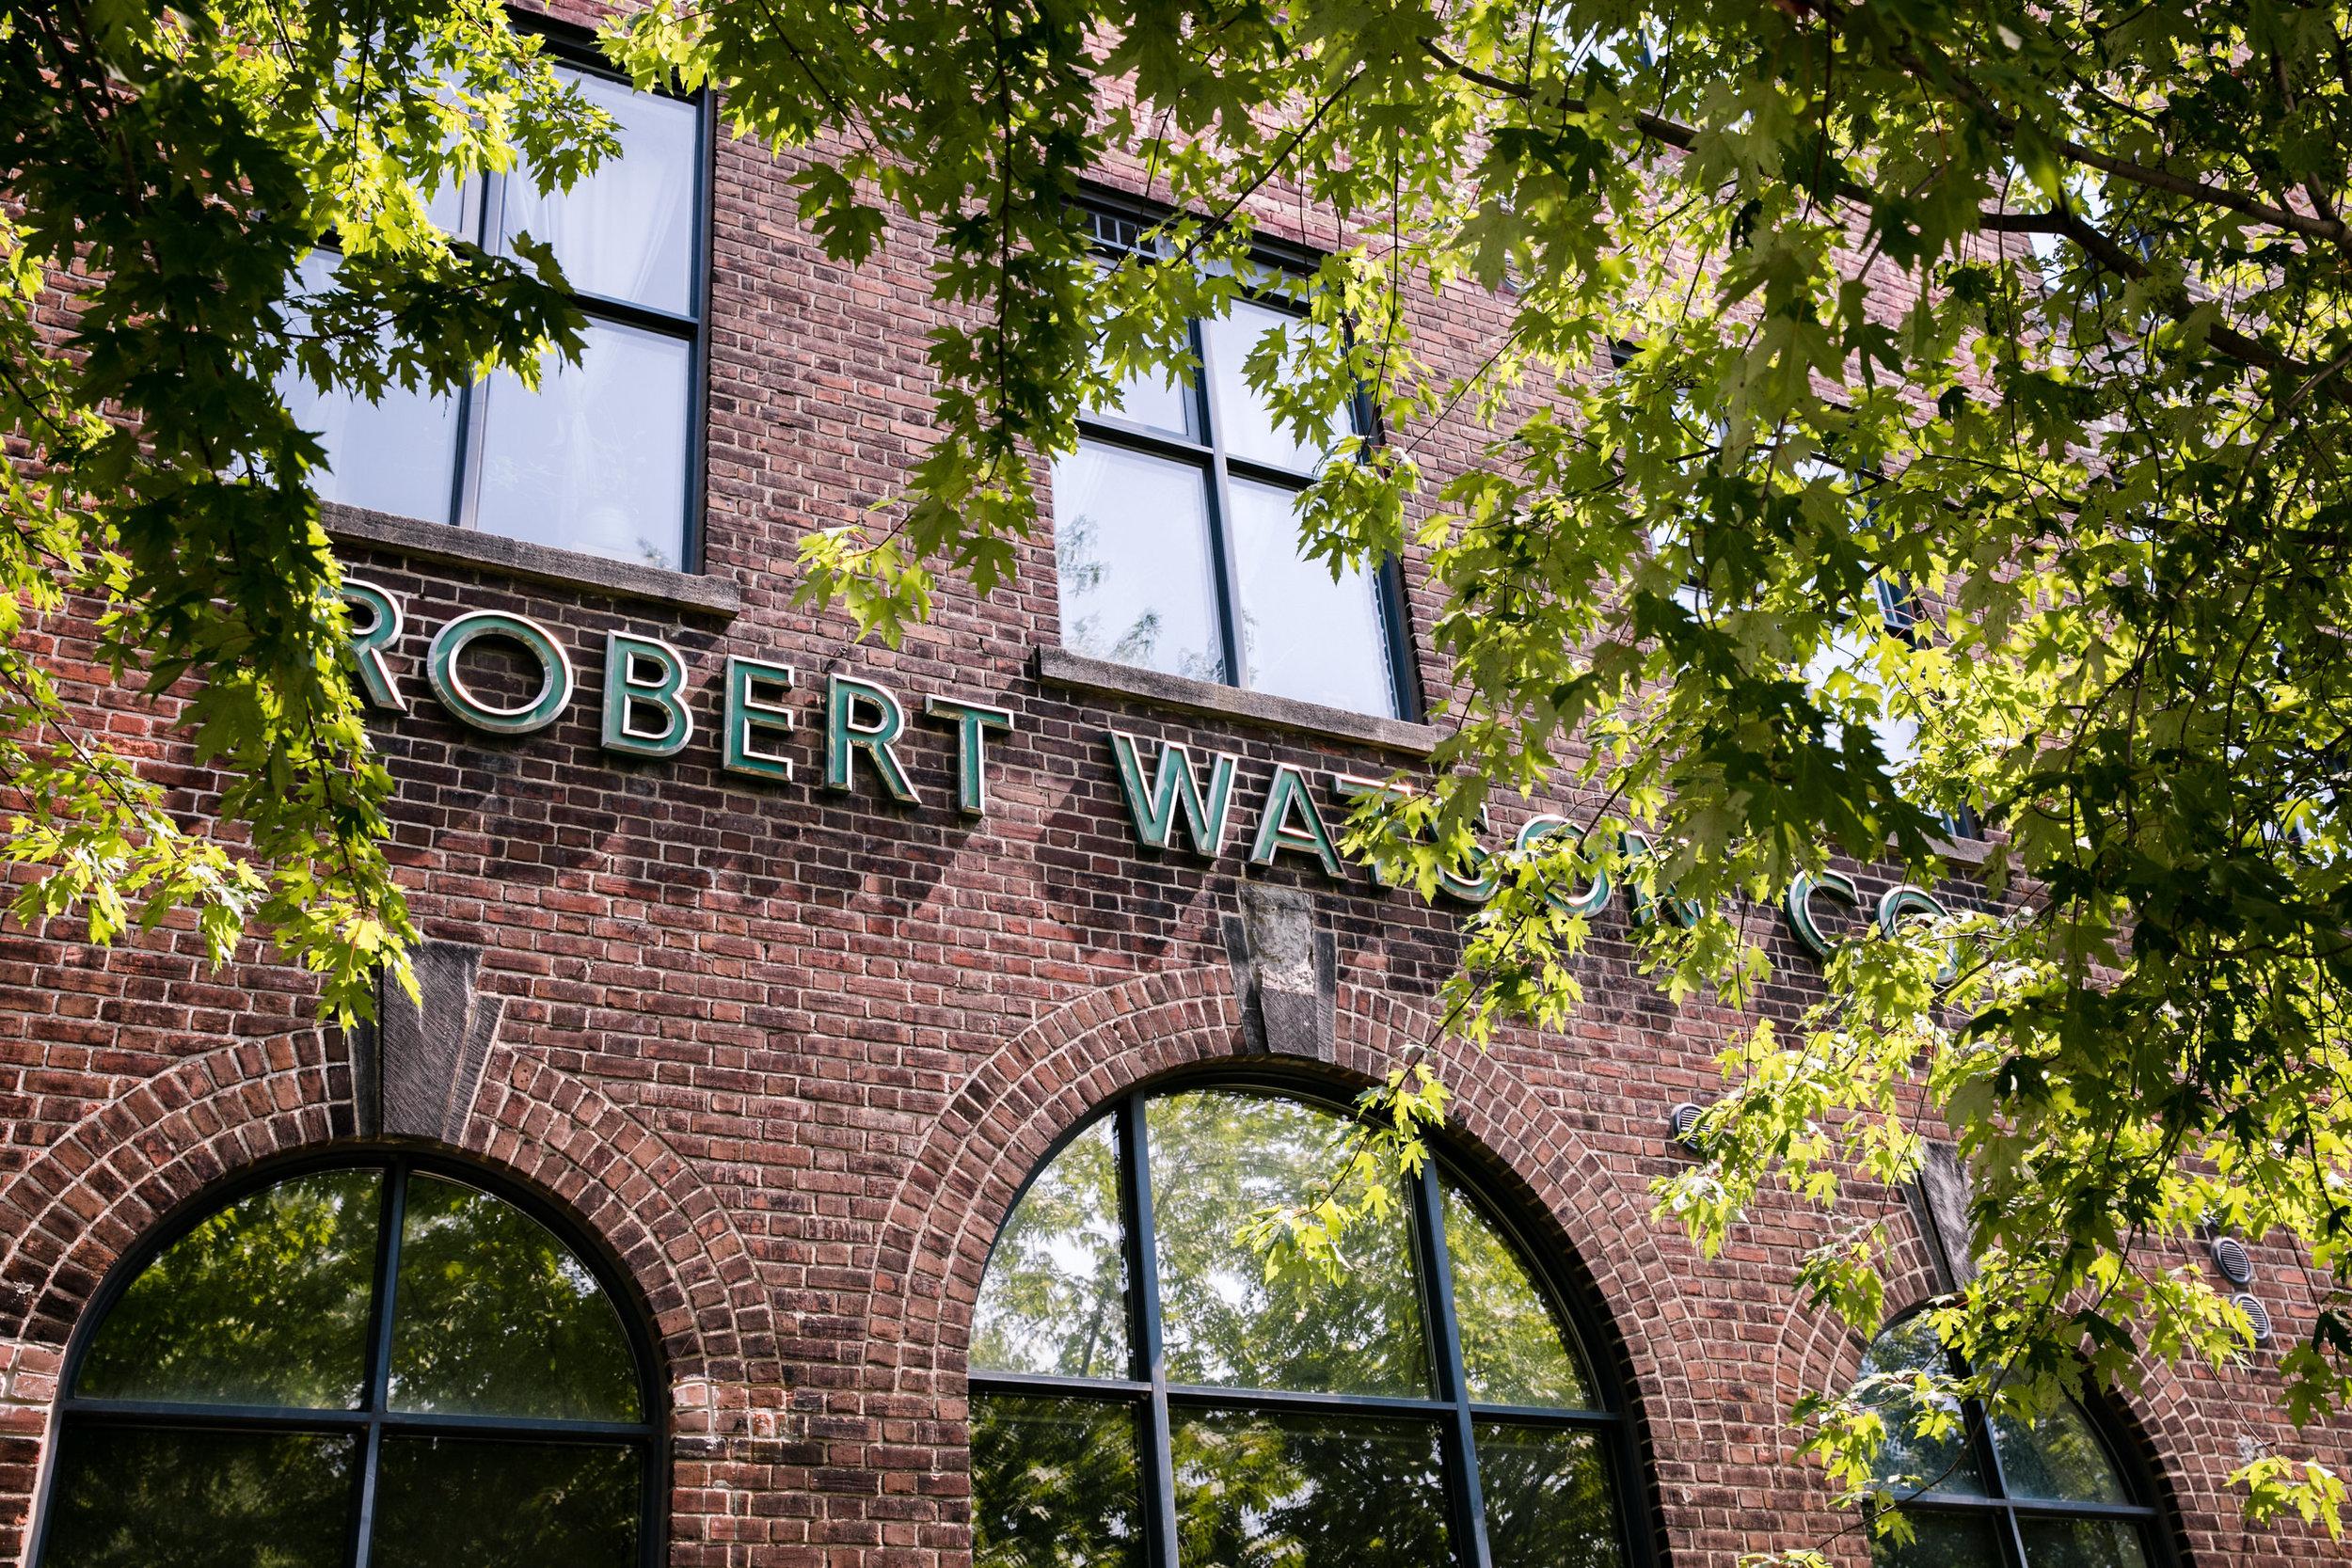 Robert Watson Lofts - Roncesvalles